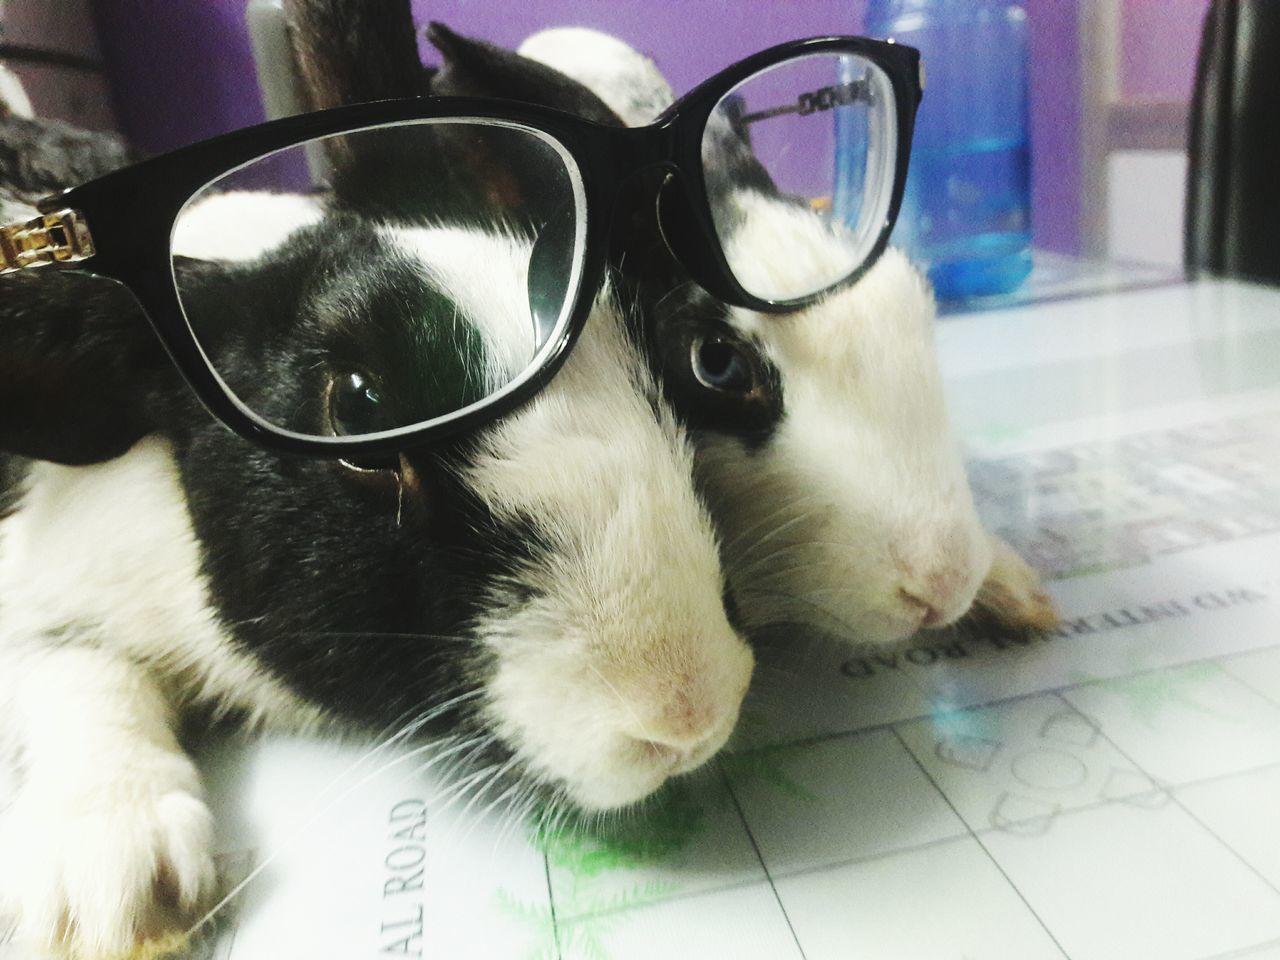 The sweetest pets ever Rabbits 🐇 Changu_mangu First Eyeem Photo